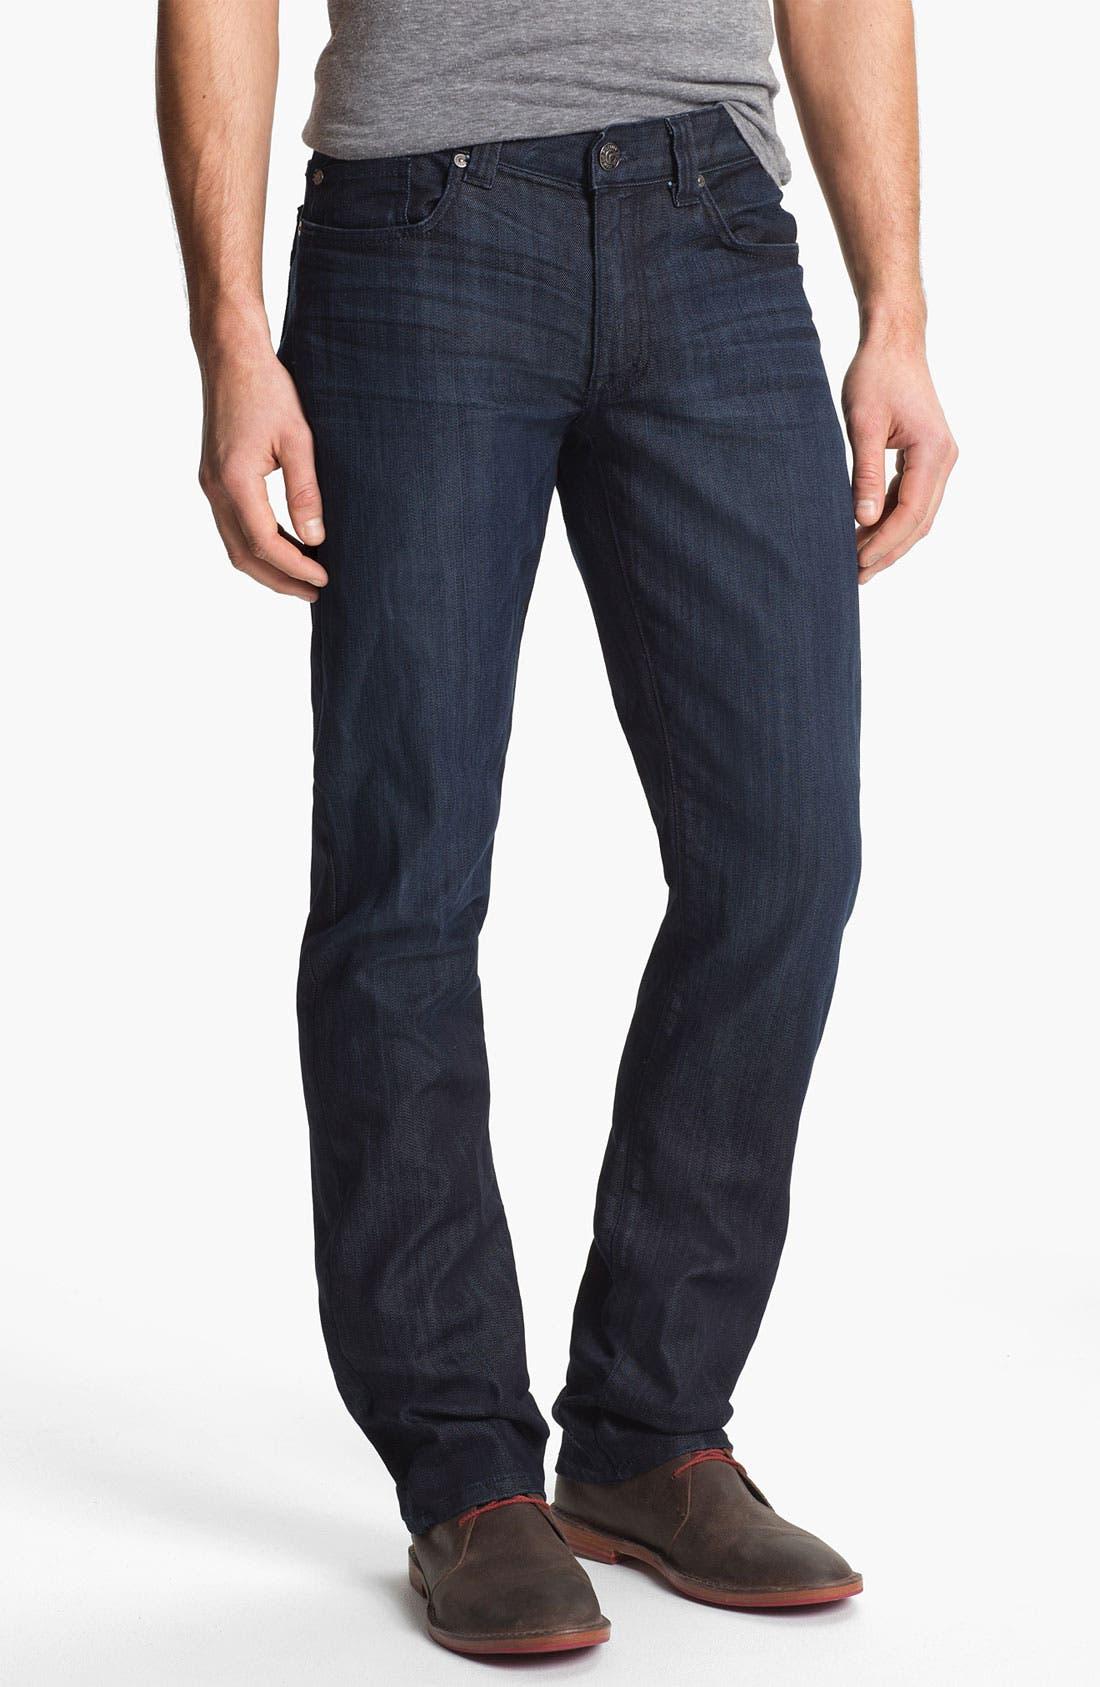 Alternate Image 1 Selected - Fidelity Denim 'Impala' Straight Leg Jeans (Varsity Dark)